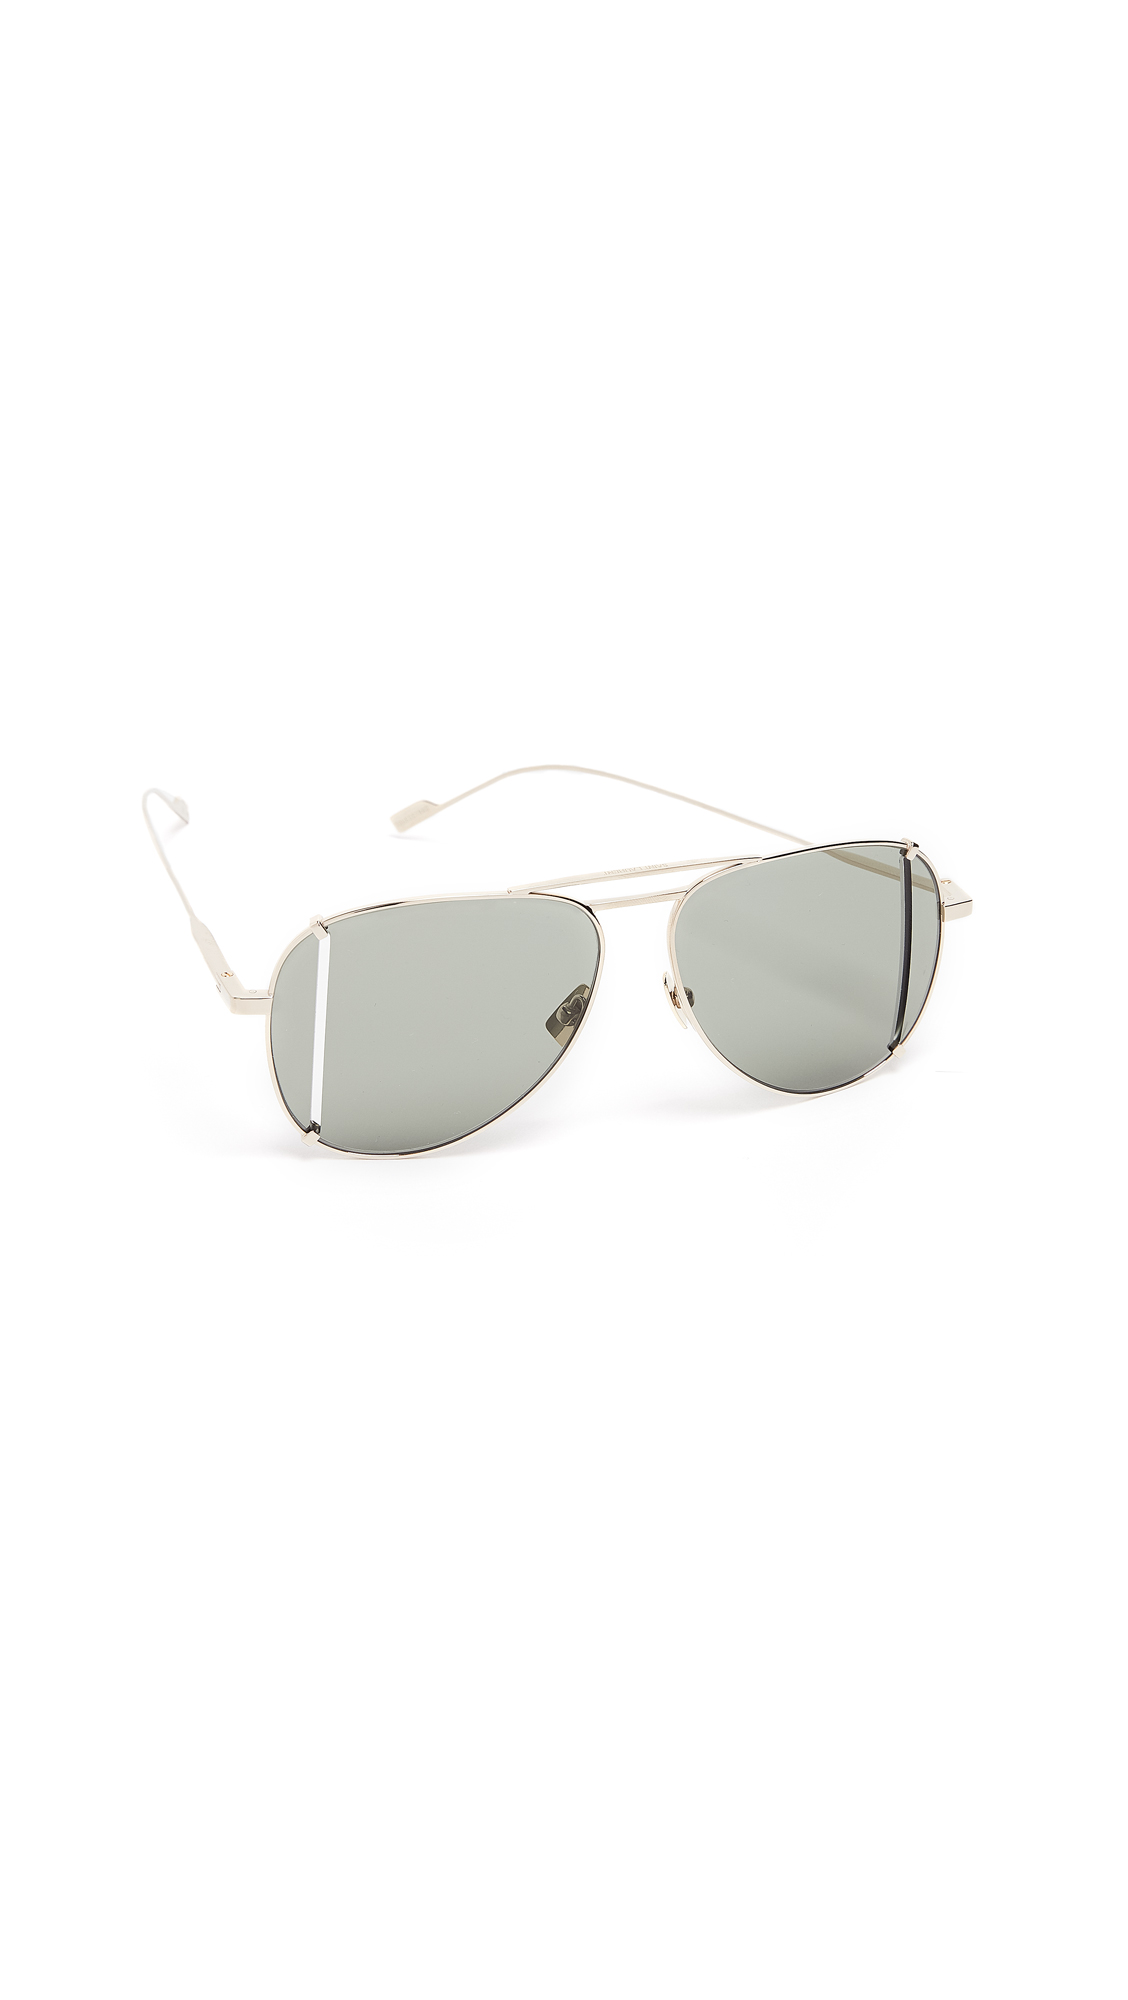 Saint Laurent SL 193 Aviator Sunglasses In Gold/Solid Green